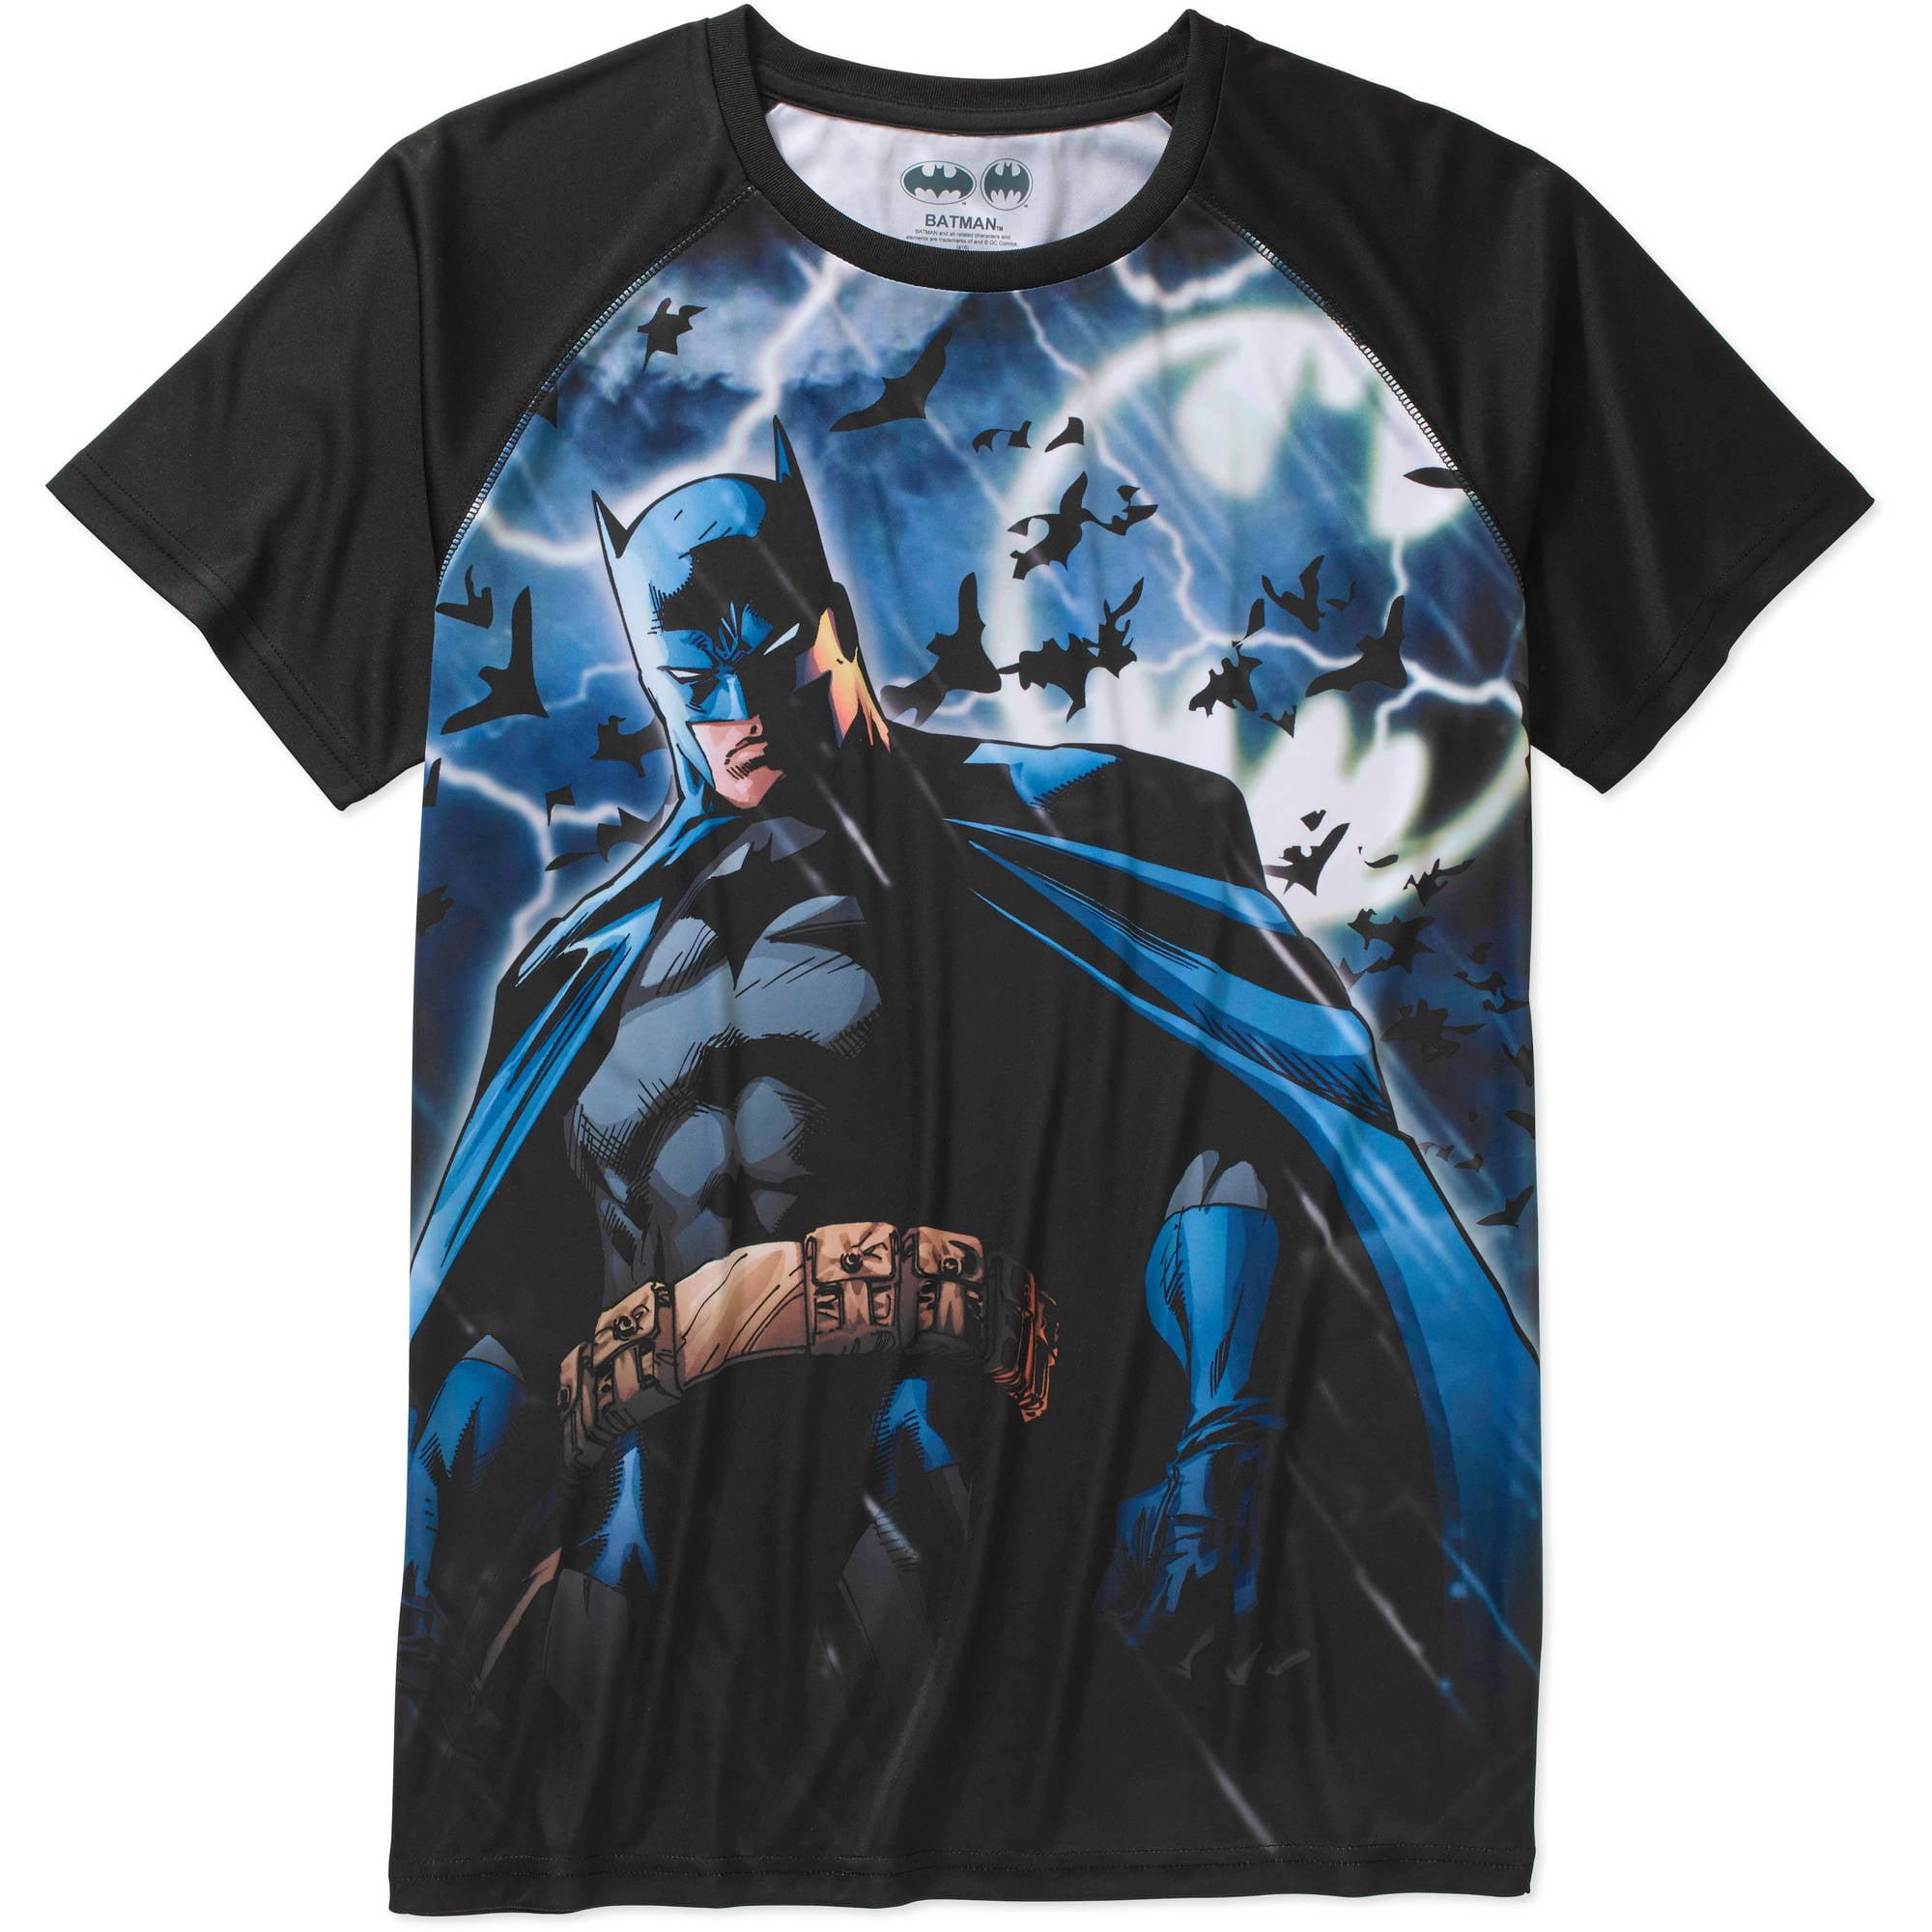 Batman Sublimated Men's Raglan Graphic Tee